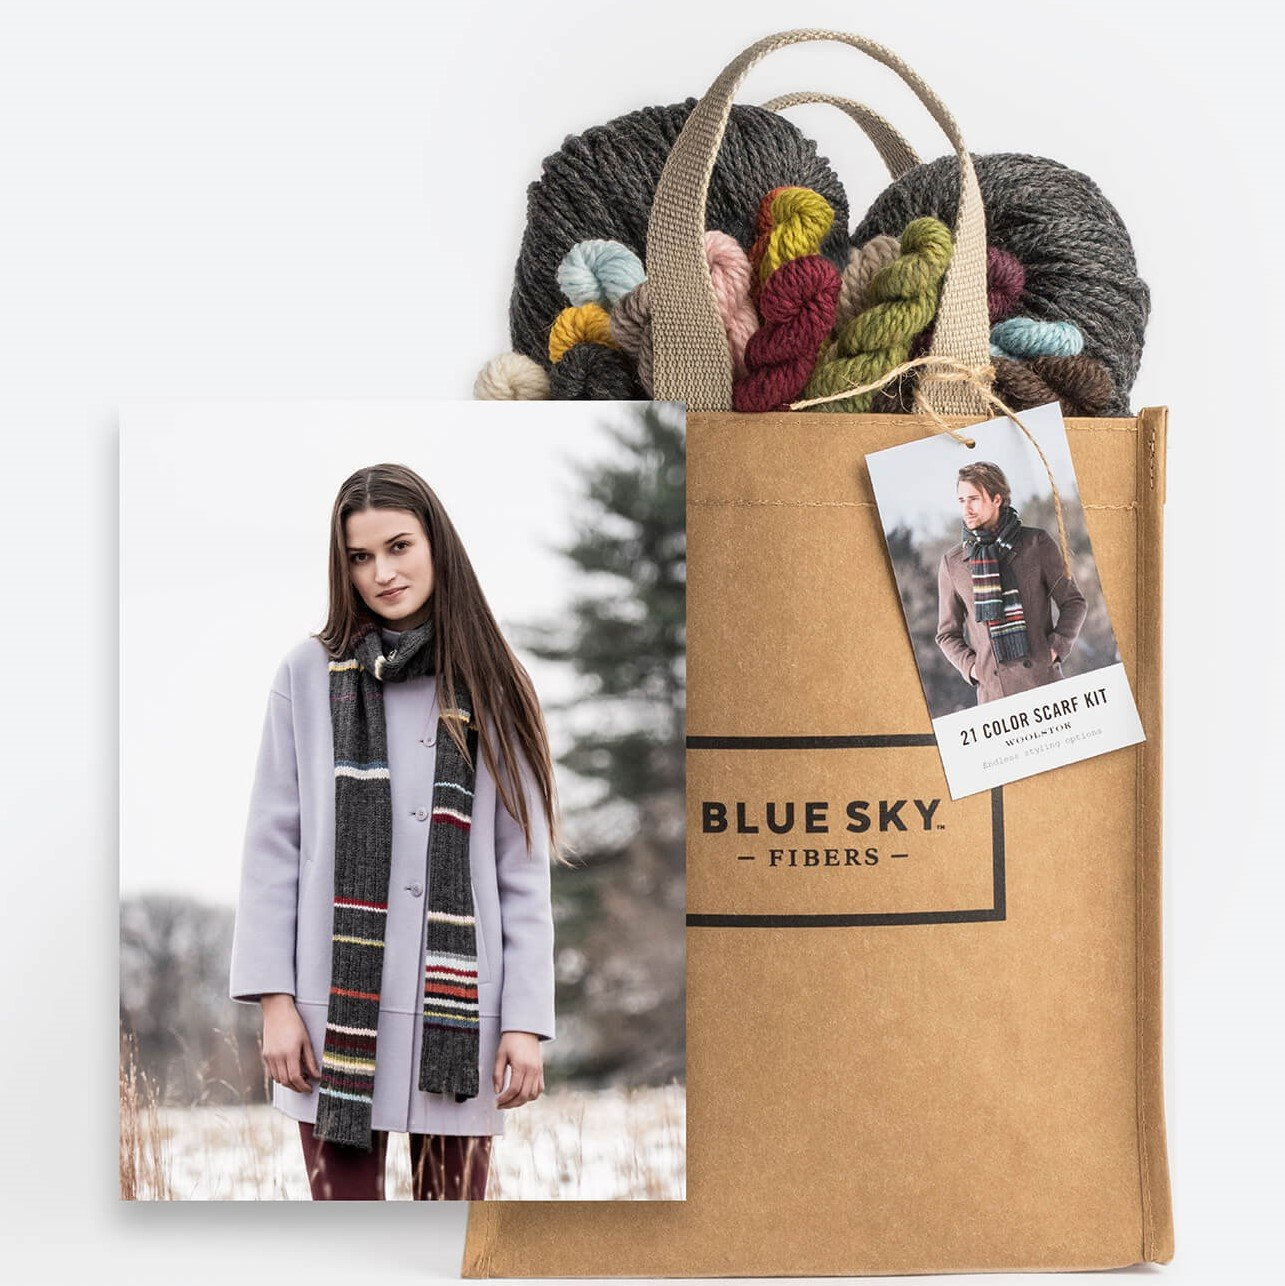 21 Color Scarf Kit by Blue Sky Fibers